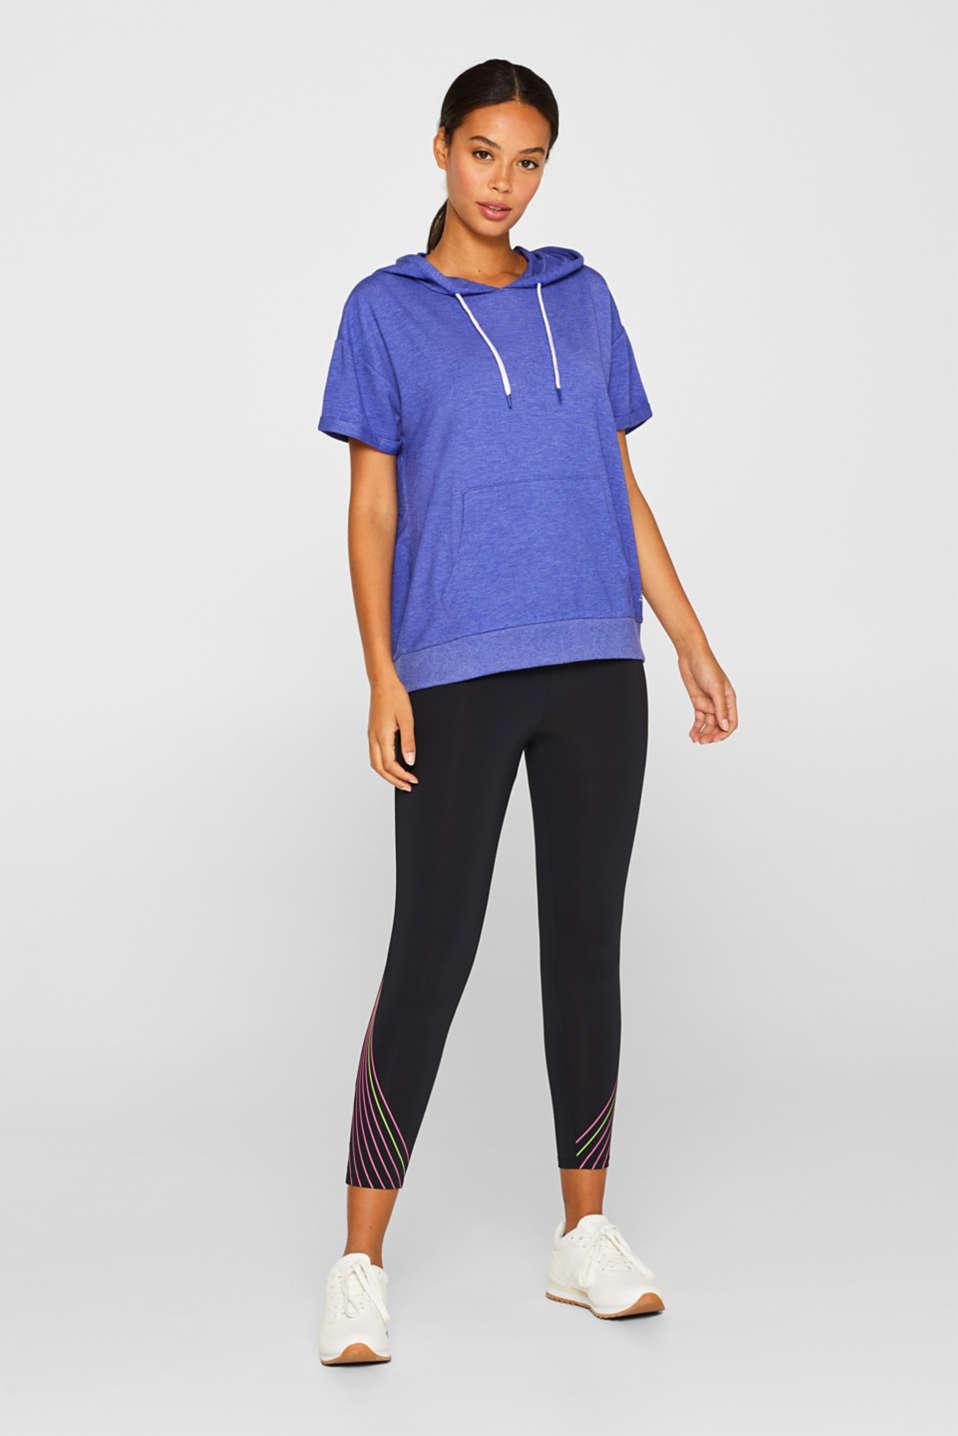 Sweatshirts, BRIGHT BLUE 2, detail image number 1